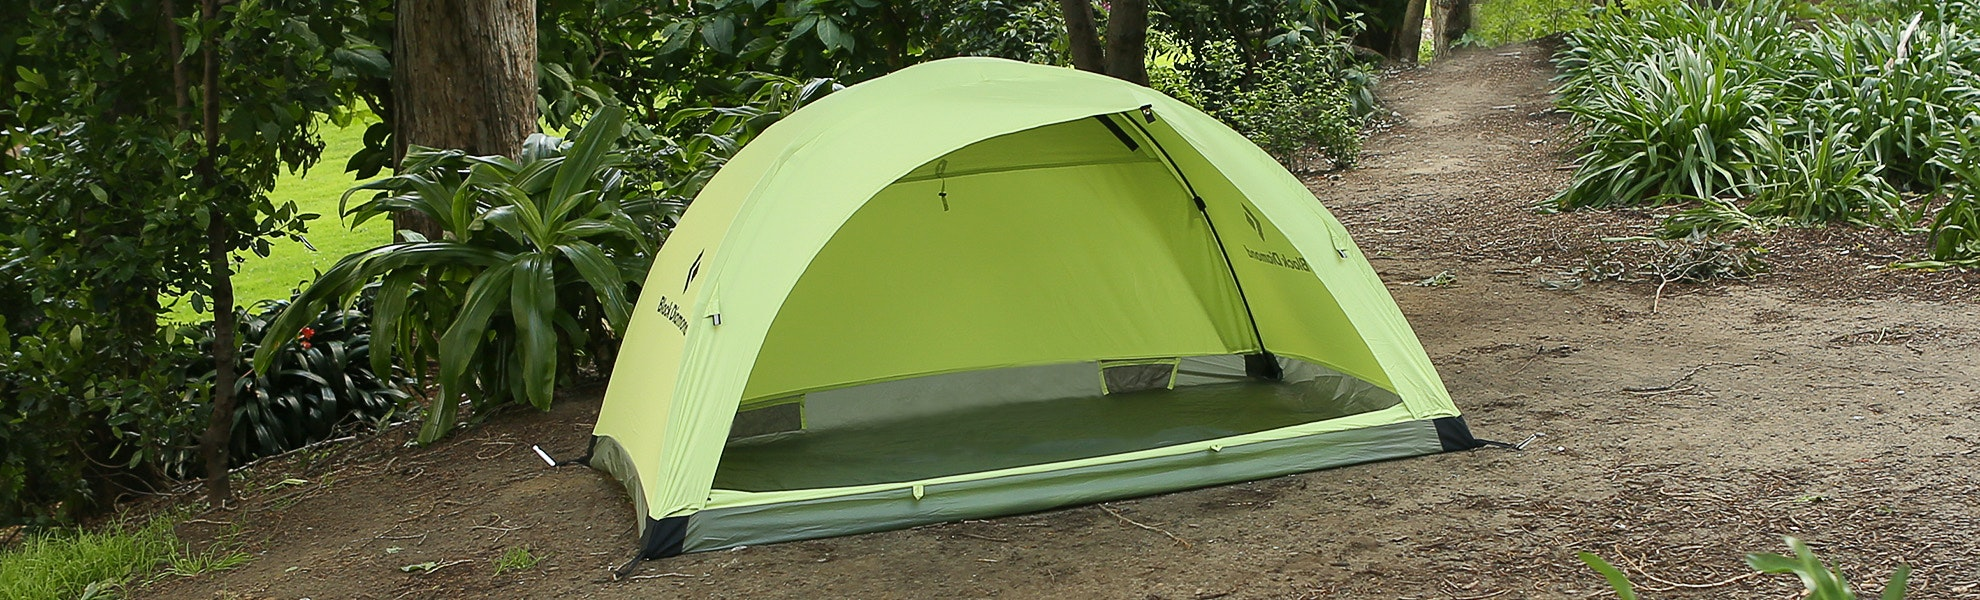 Black Diamond HiLight Tent & Black Diamond HiLight Tent   Price u0026 Reviews   Massdrop